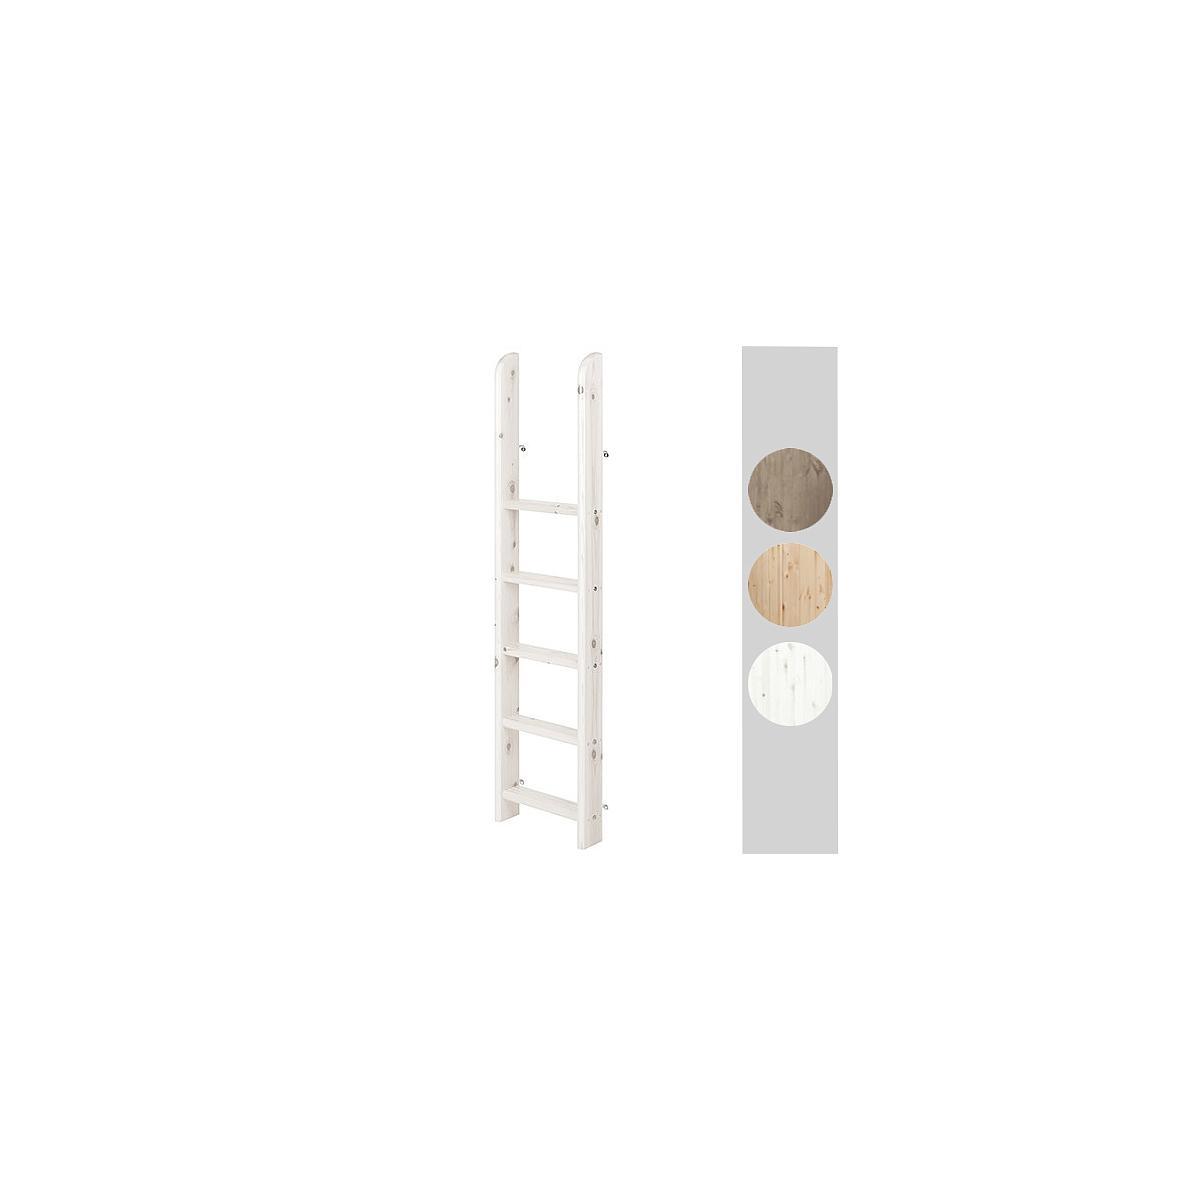 Escalera recta Cama alta CLASSIC Flexa blanco cal